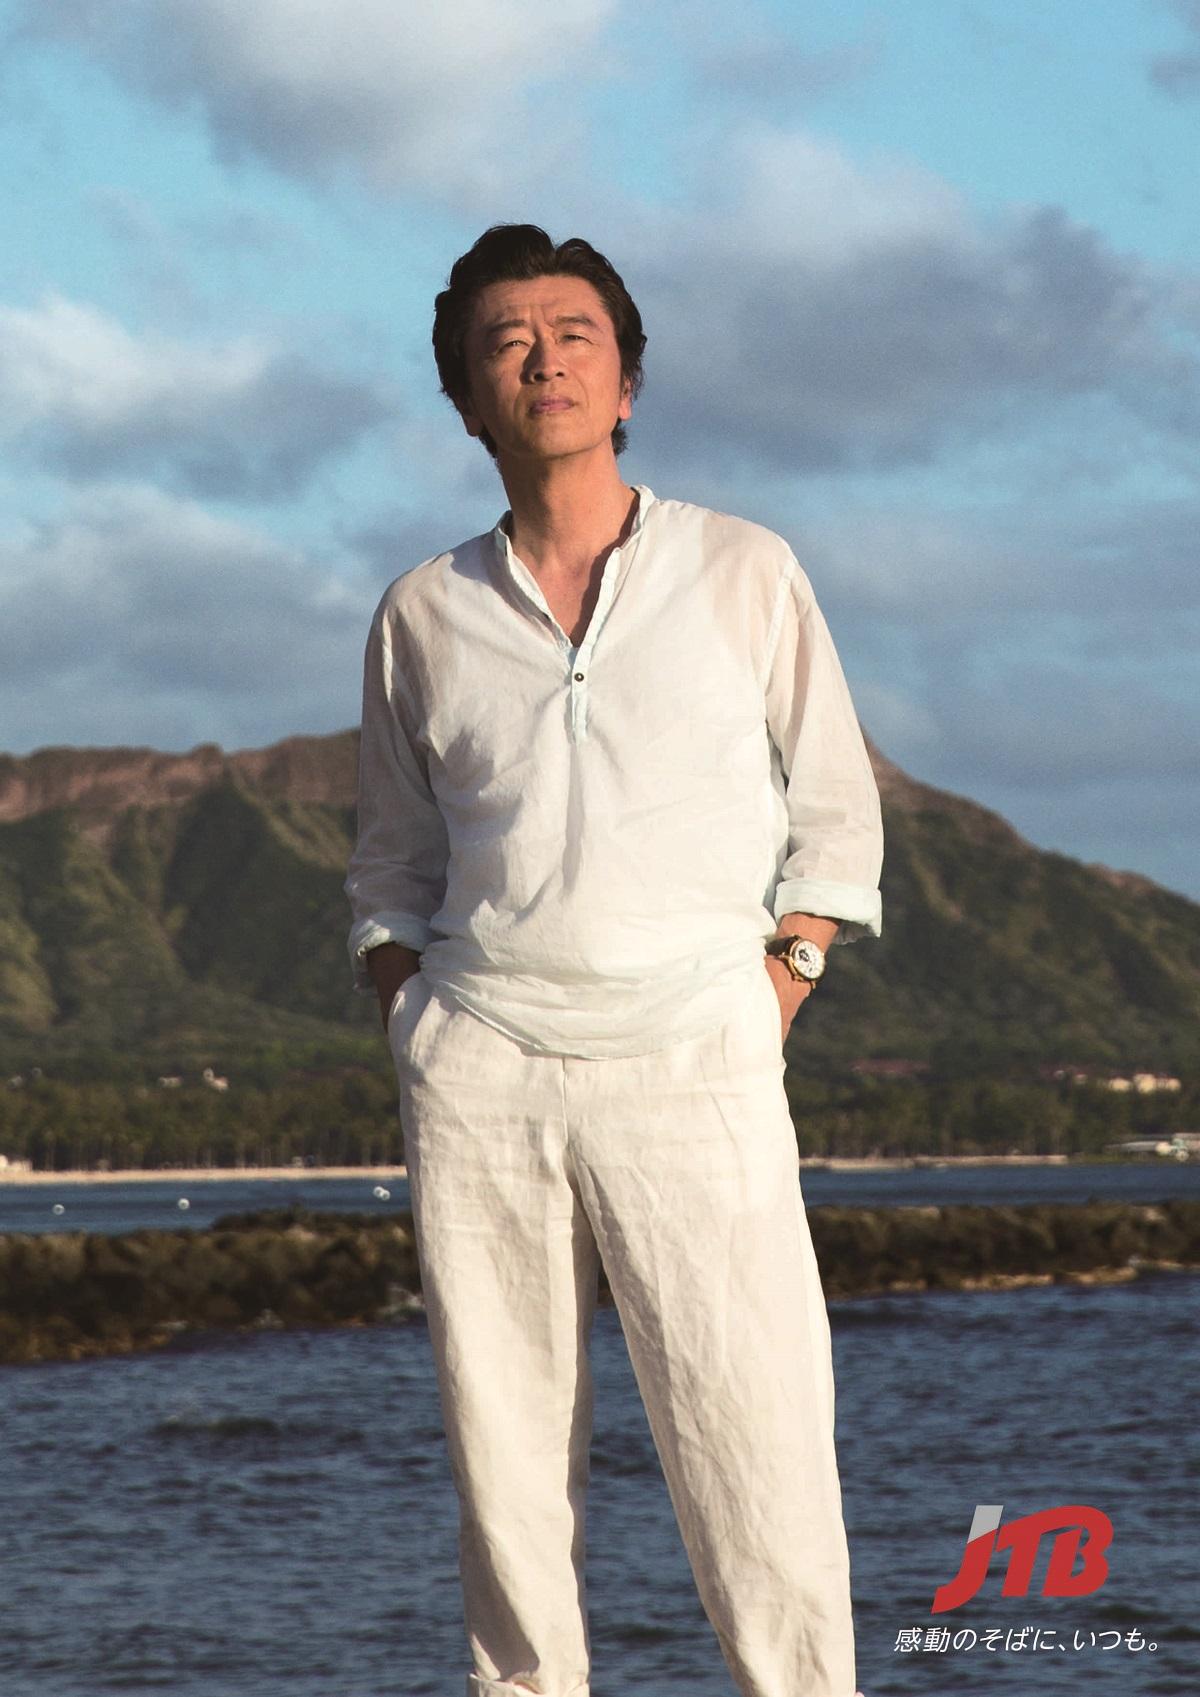 JTB、桑田佳祐さん出演の新テレビCMを放送開始、書下ろしの新曲も披露 【動画】